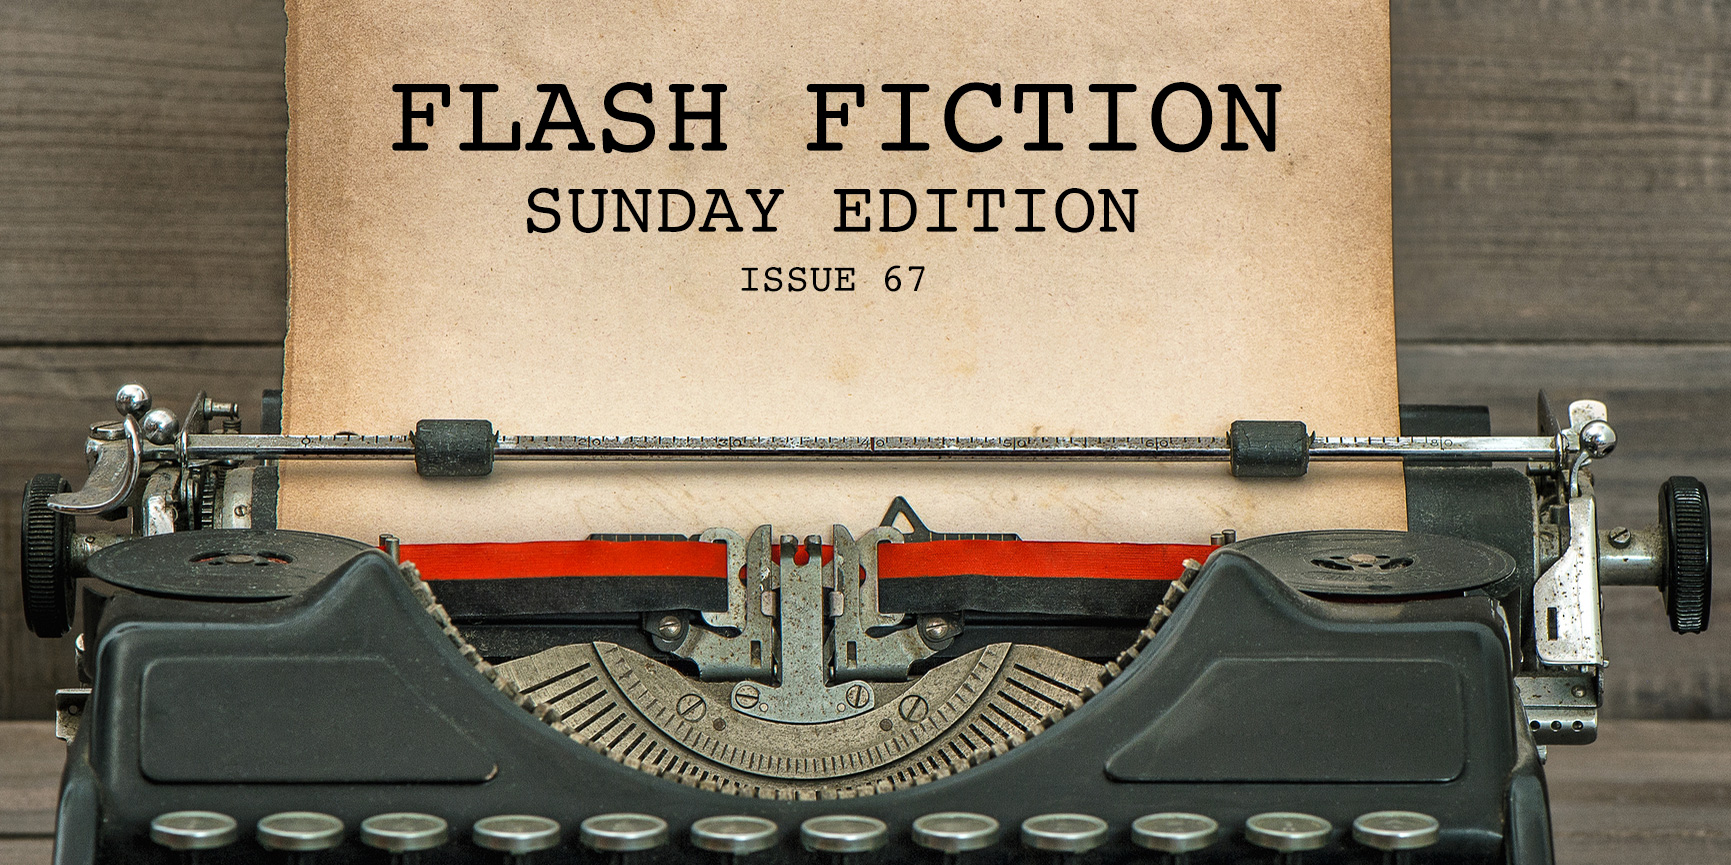 Flash Fiction Sunday Edition - Issue 67